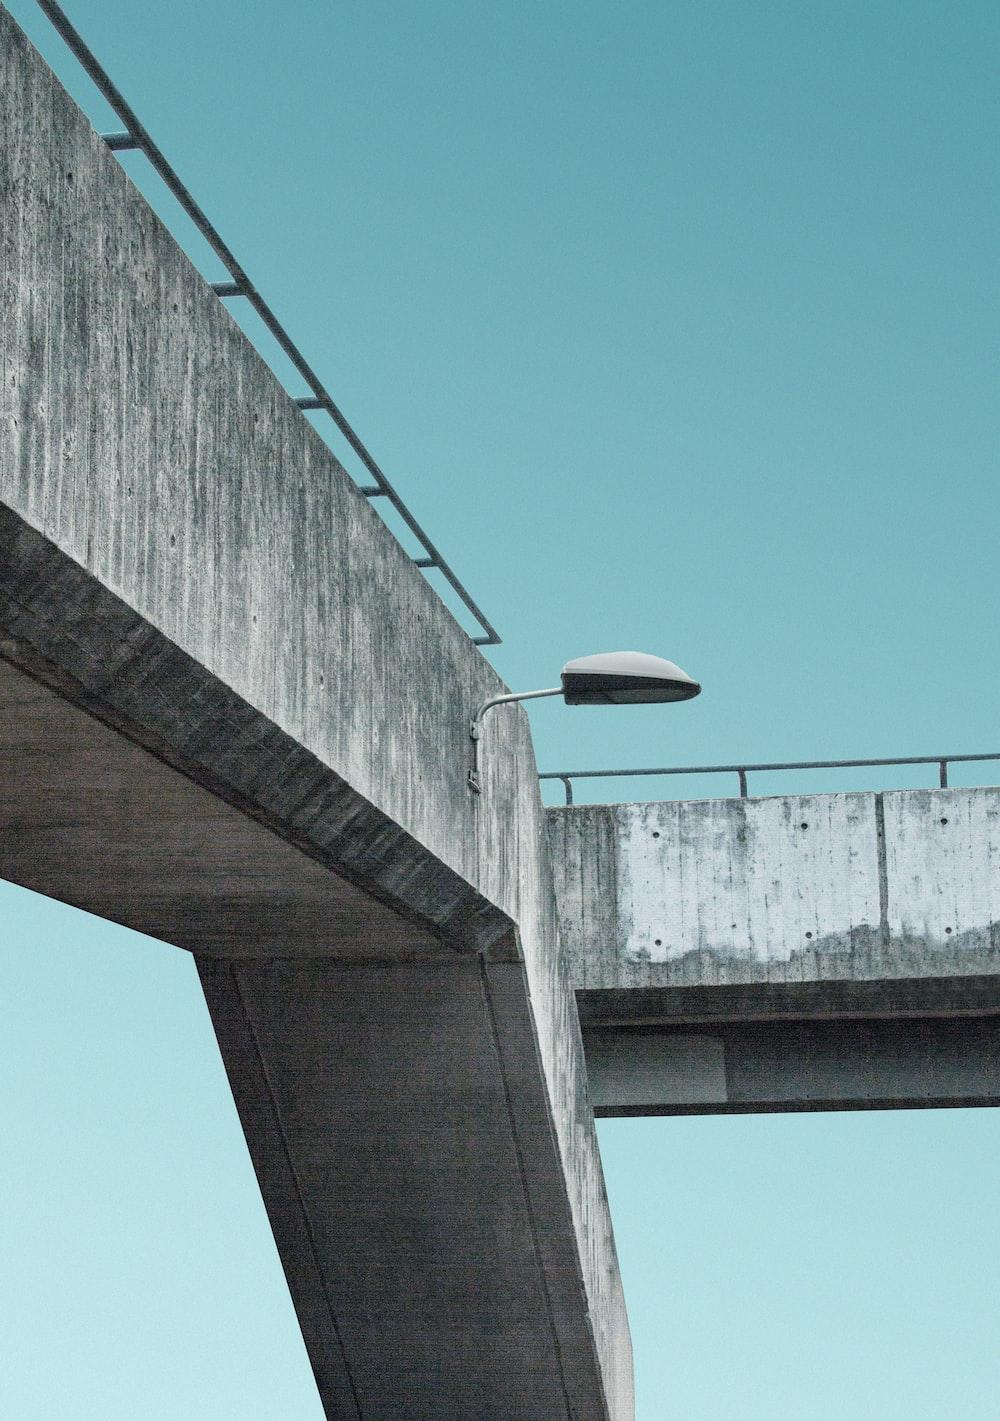 lamp on bridge